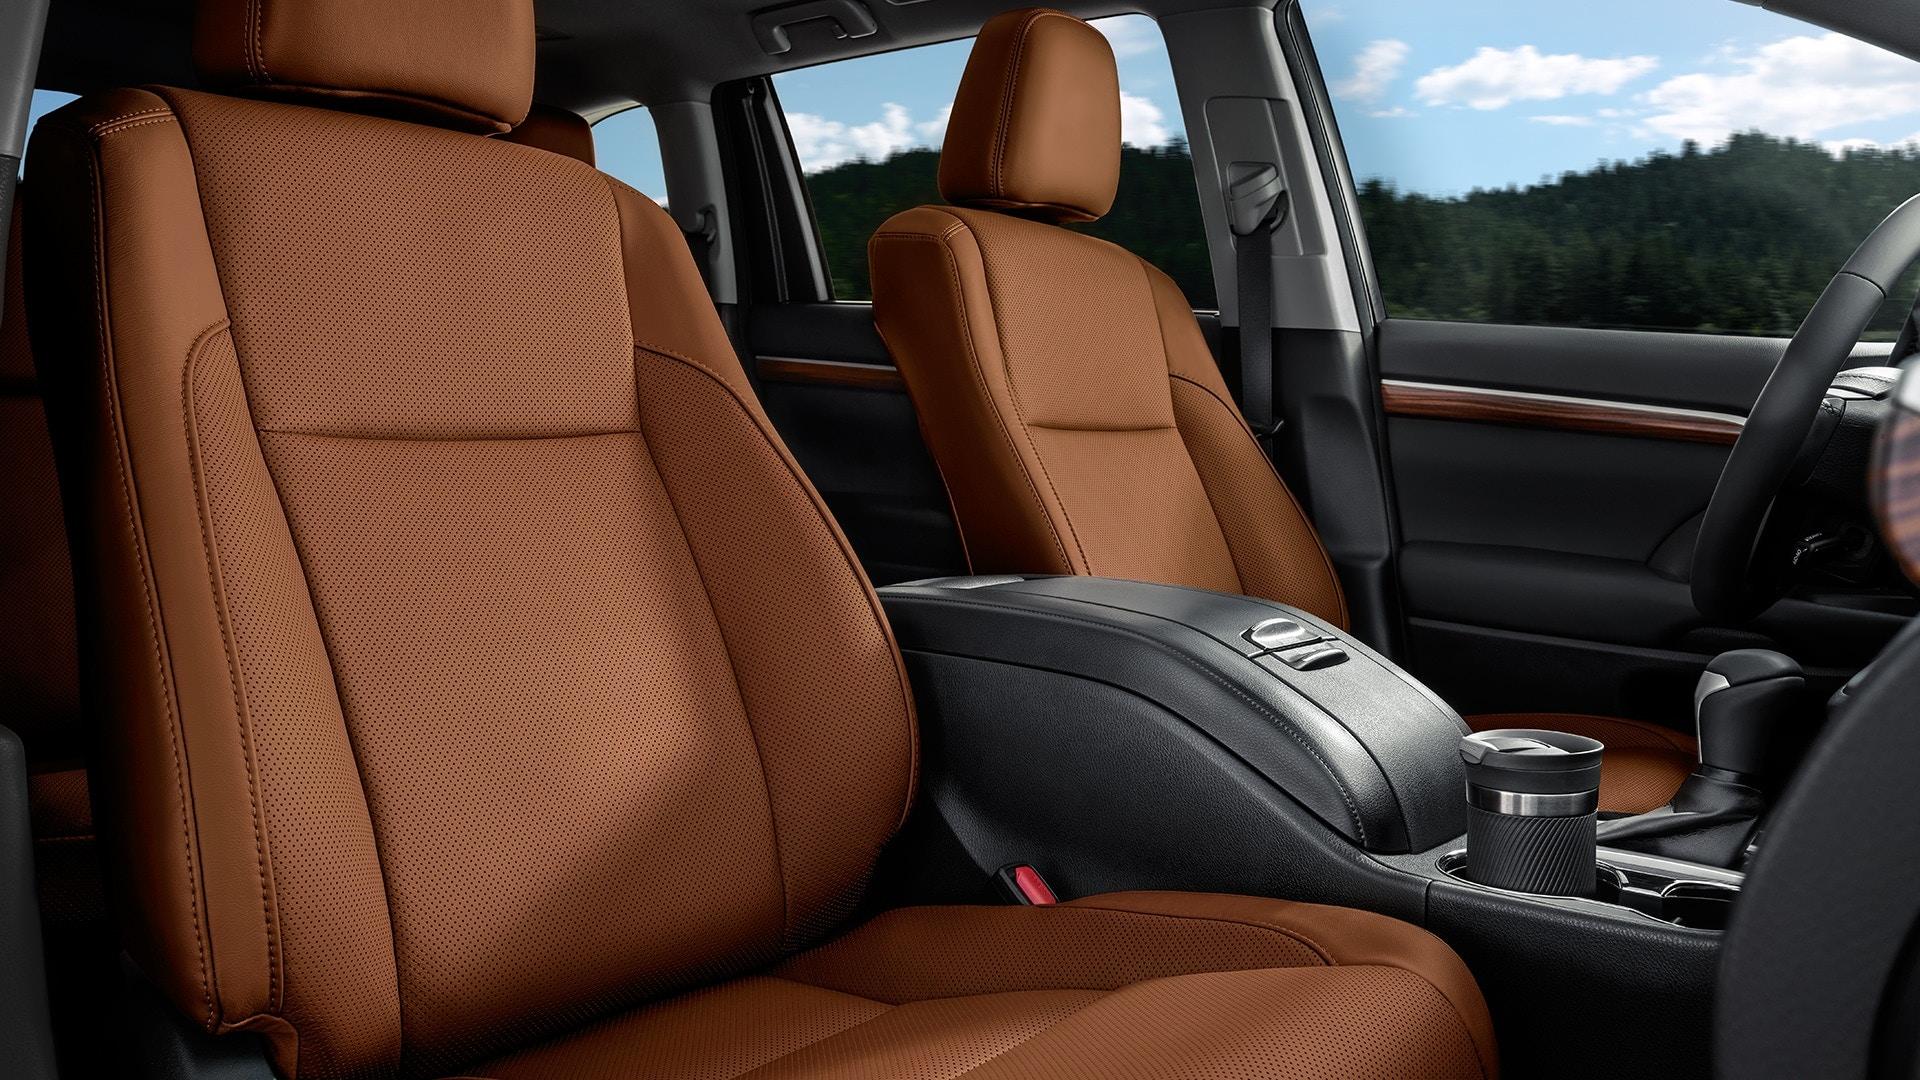 2019 Toyota Highlander Seating